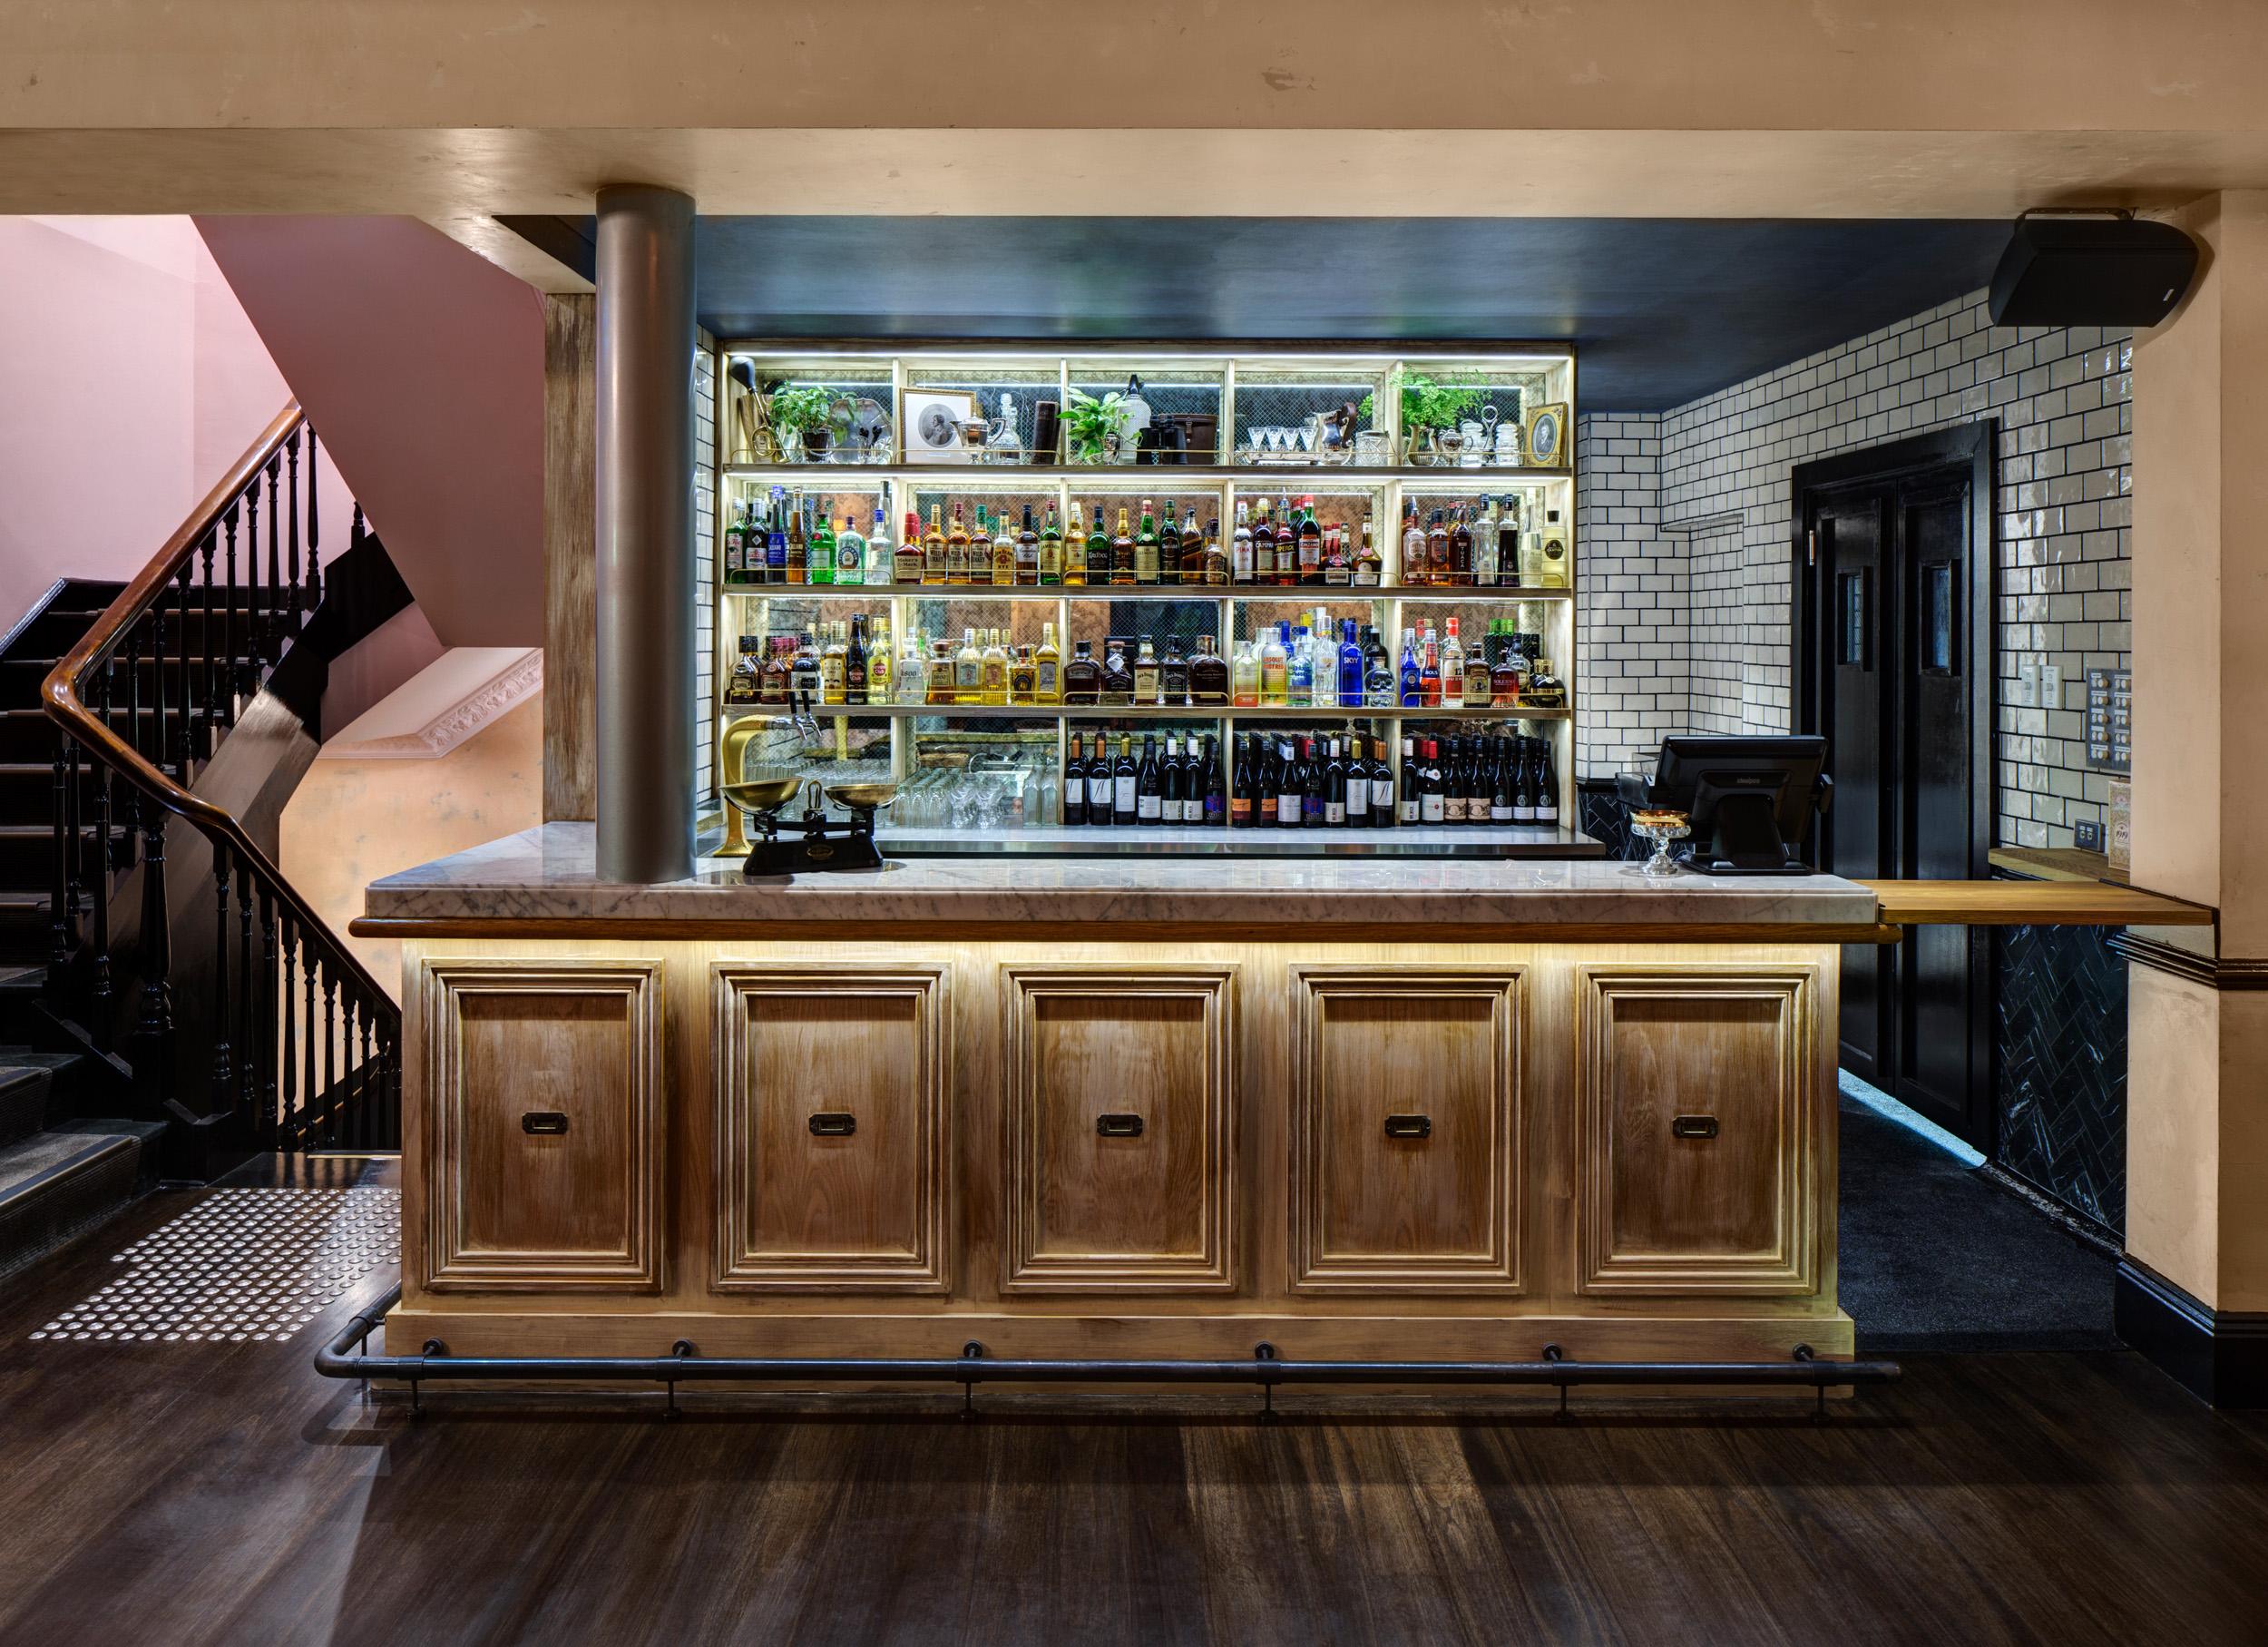 Jem_Cresswell_Architecture_Hospitality_Photographer_Sydney_Australia_019.jpg